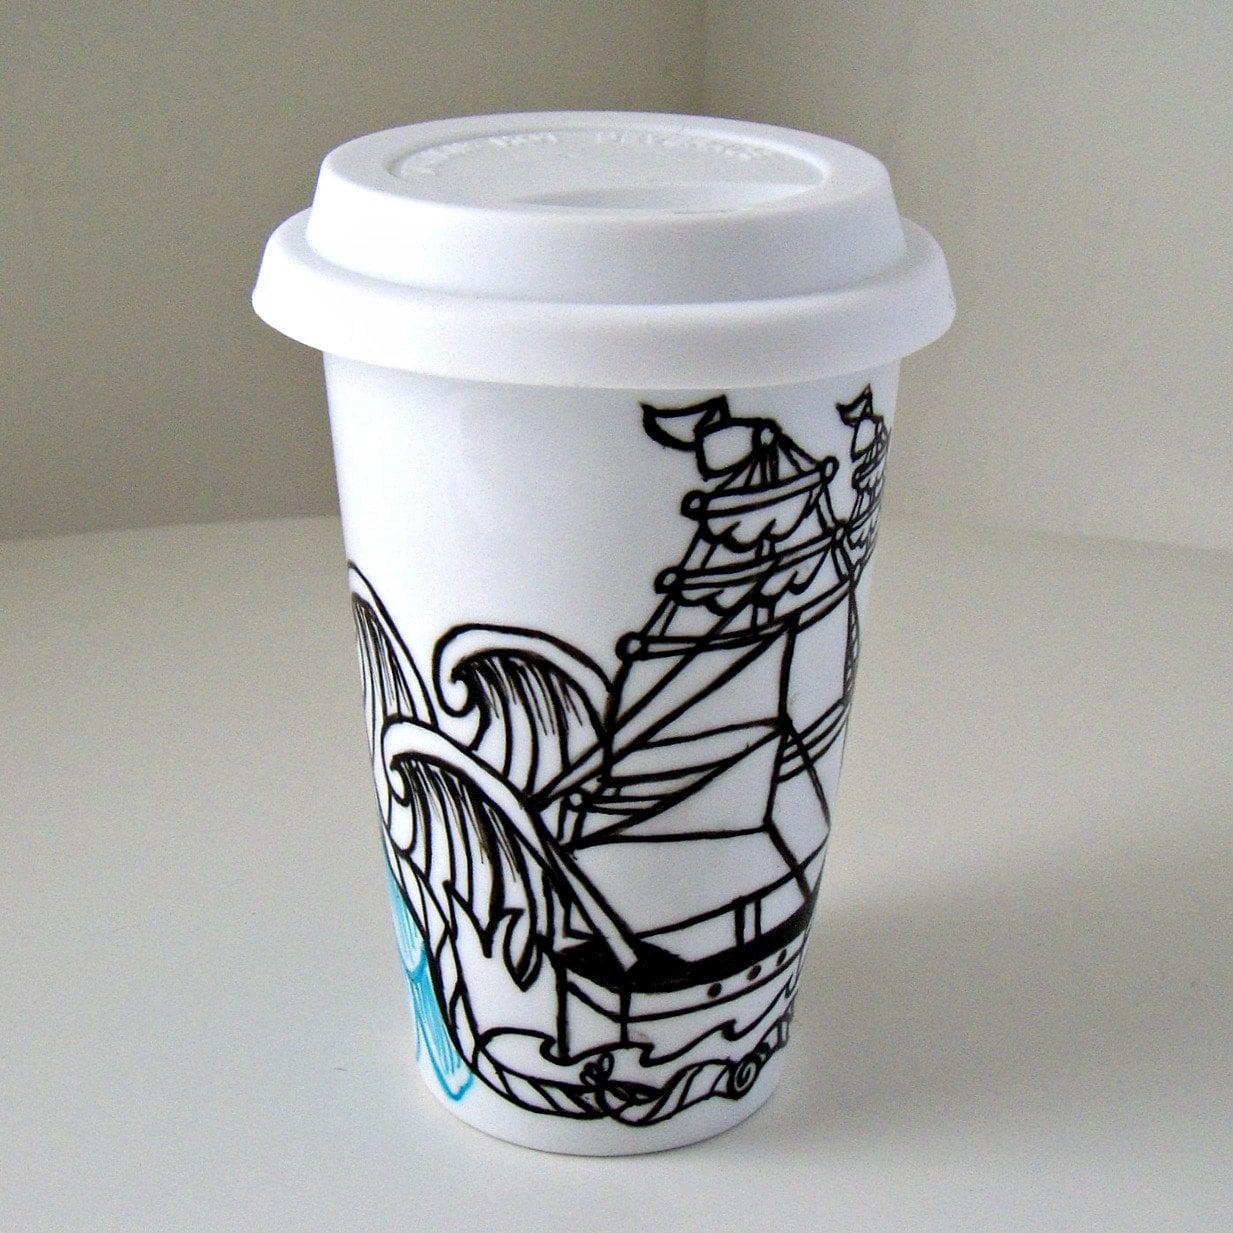 Best Reviews Ceramic Travel Mug